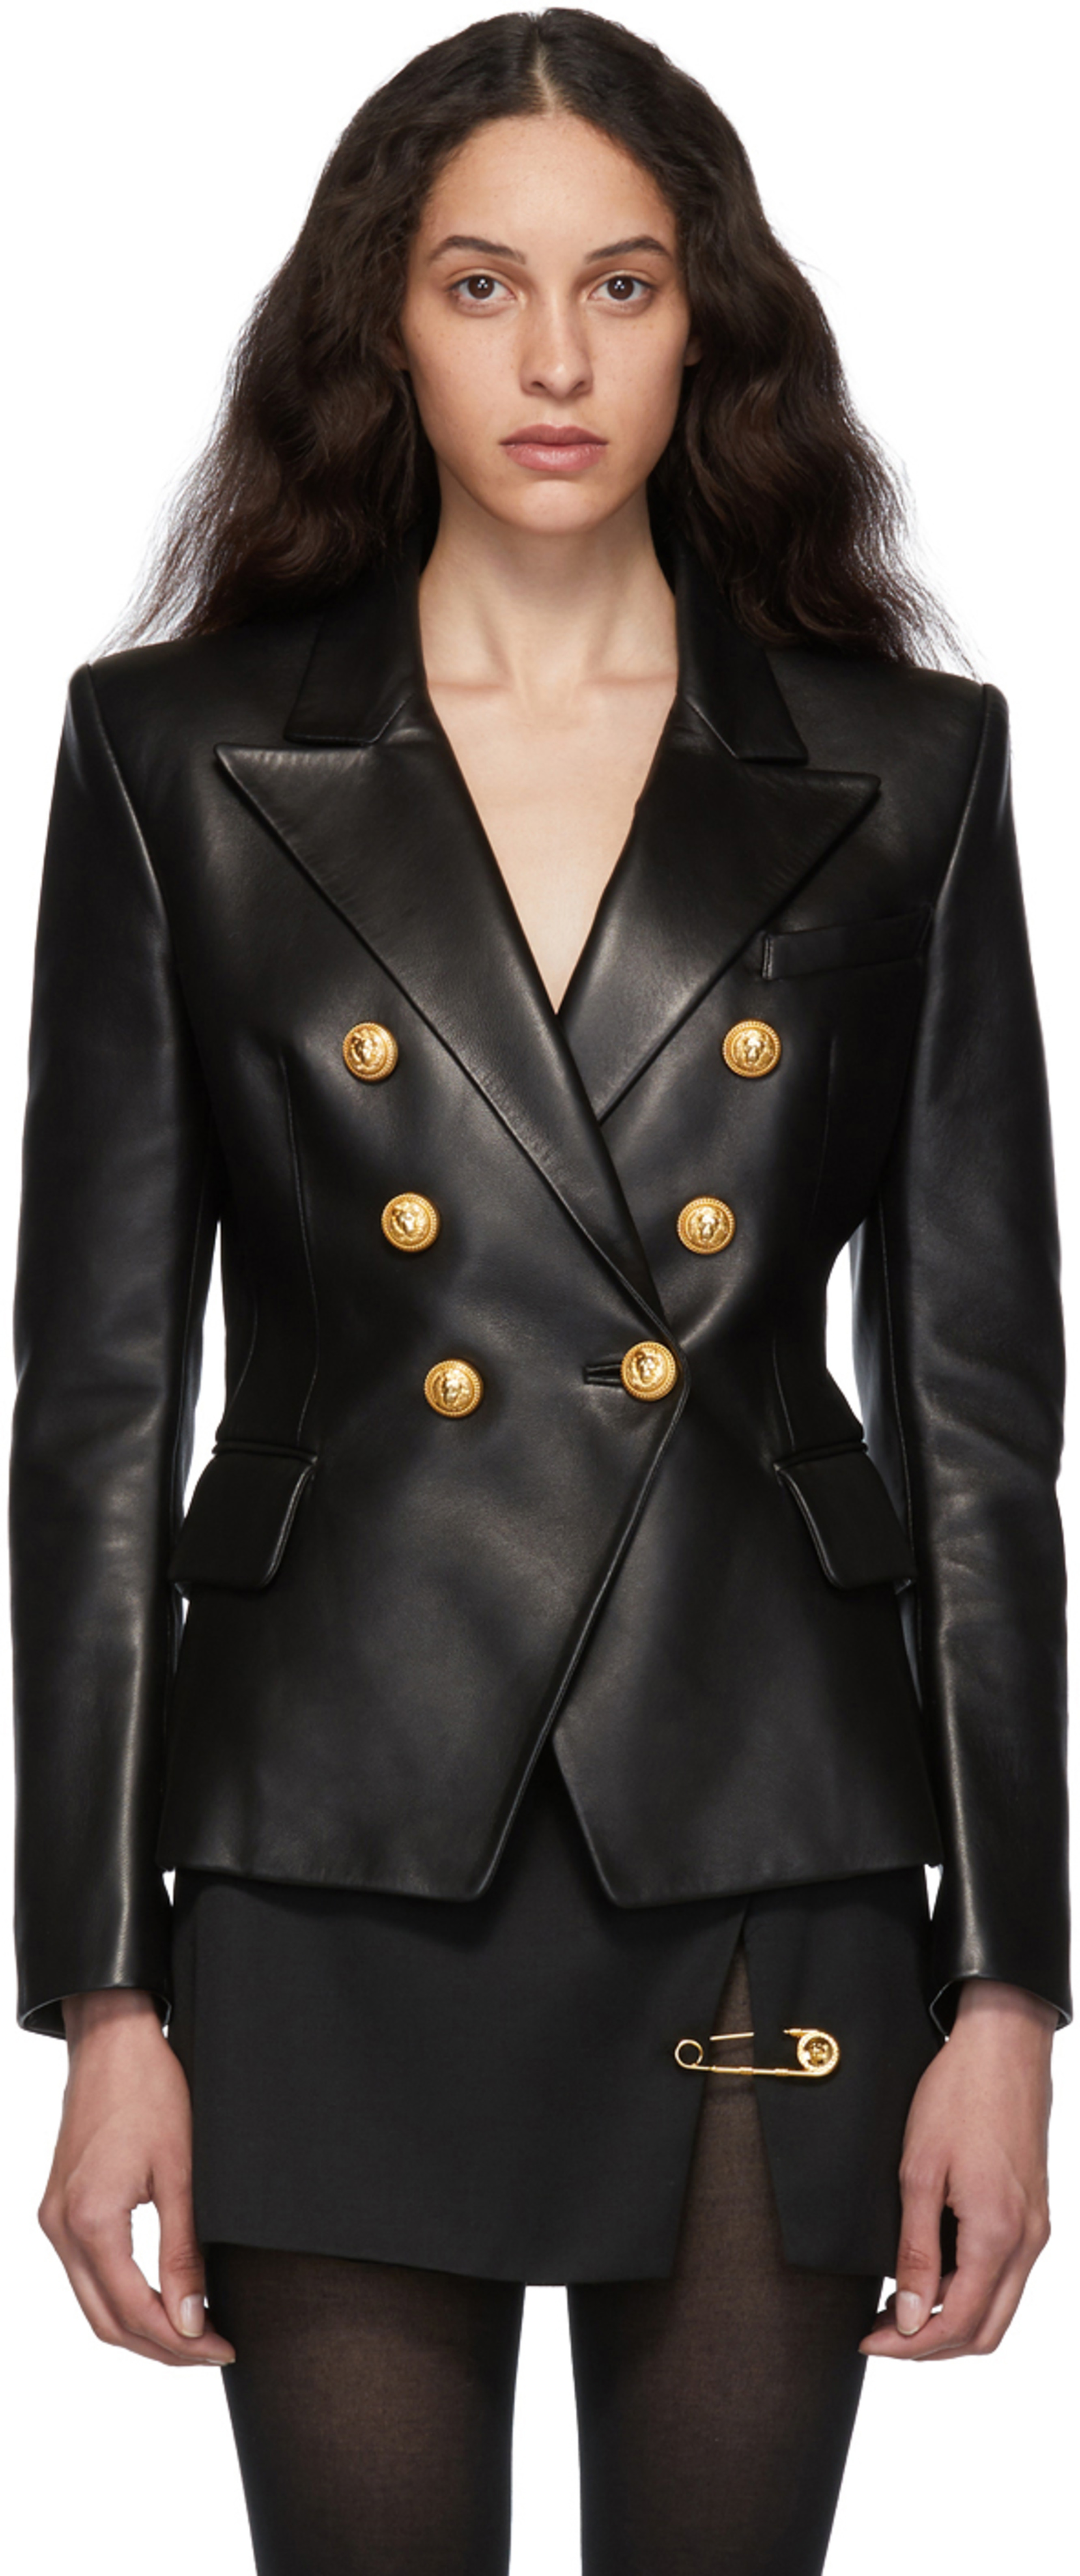 5cee2974e5b8 Designer jackets & coats for Women | SSENSE